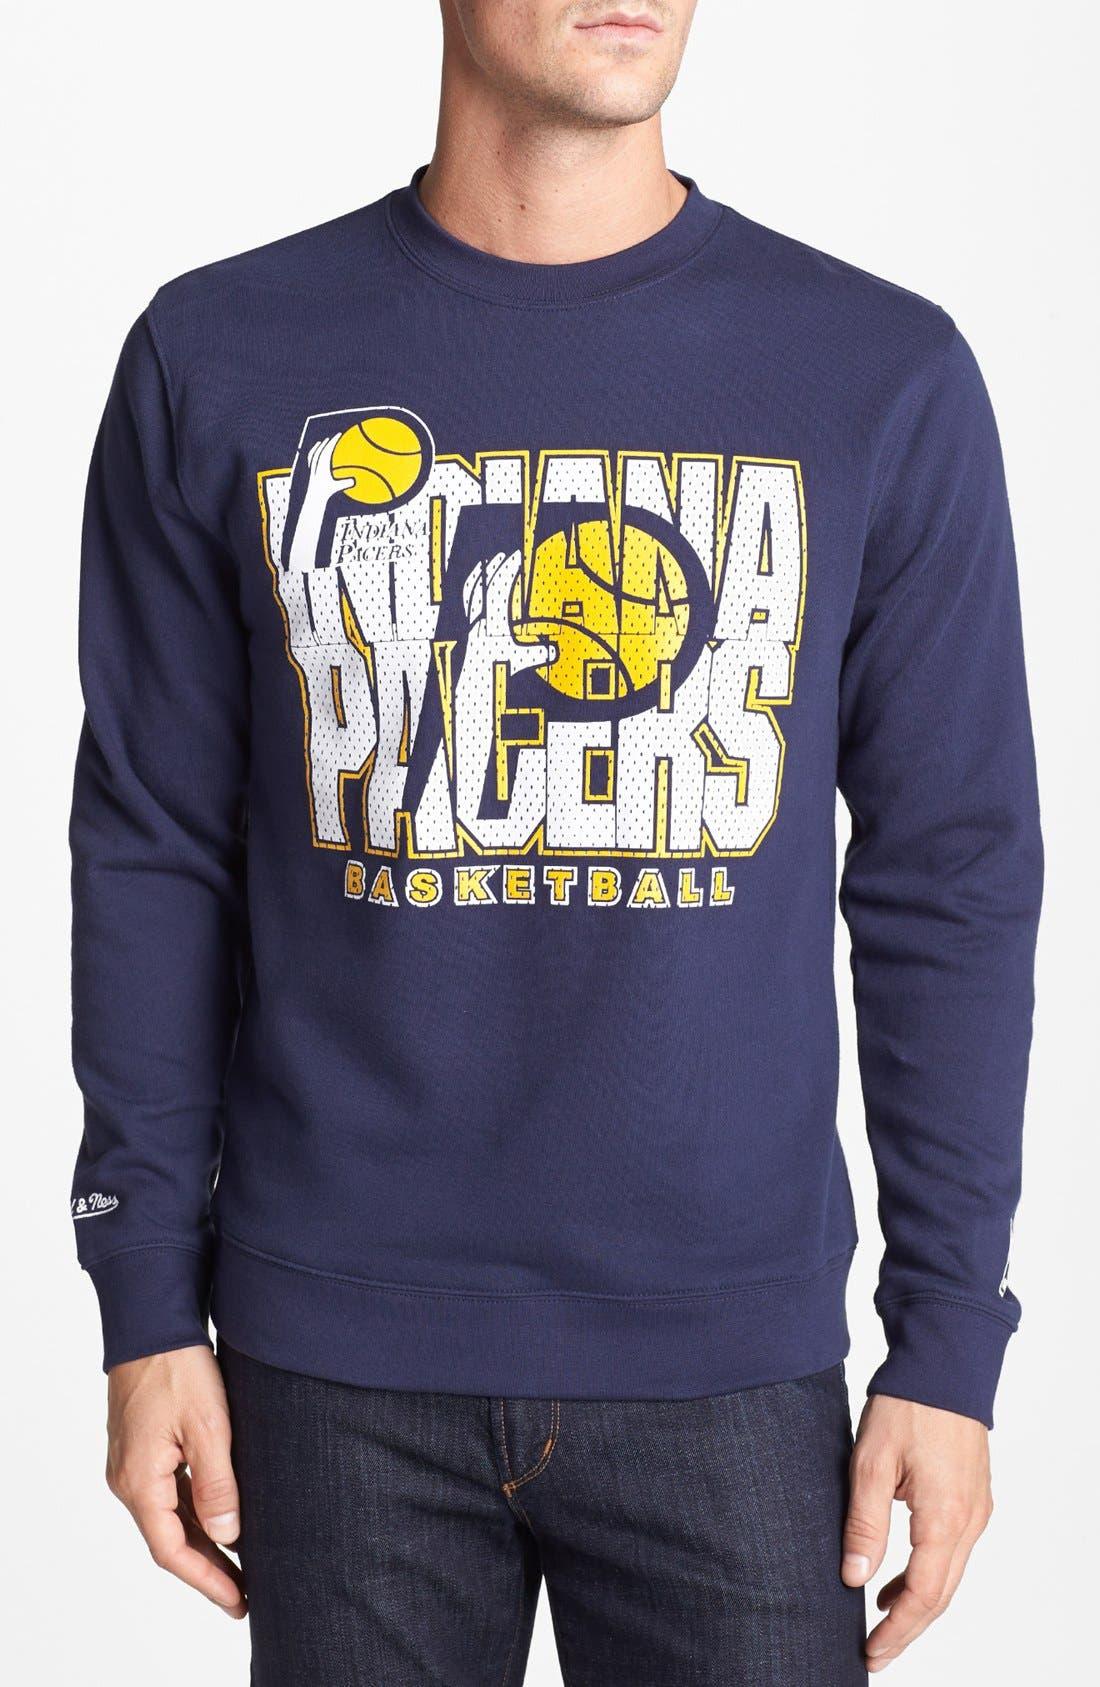 Main Image - Mitchell & Ness 'Indiana Pacers - Technical Foul' Sweatshirt